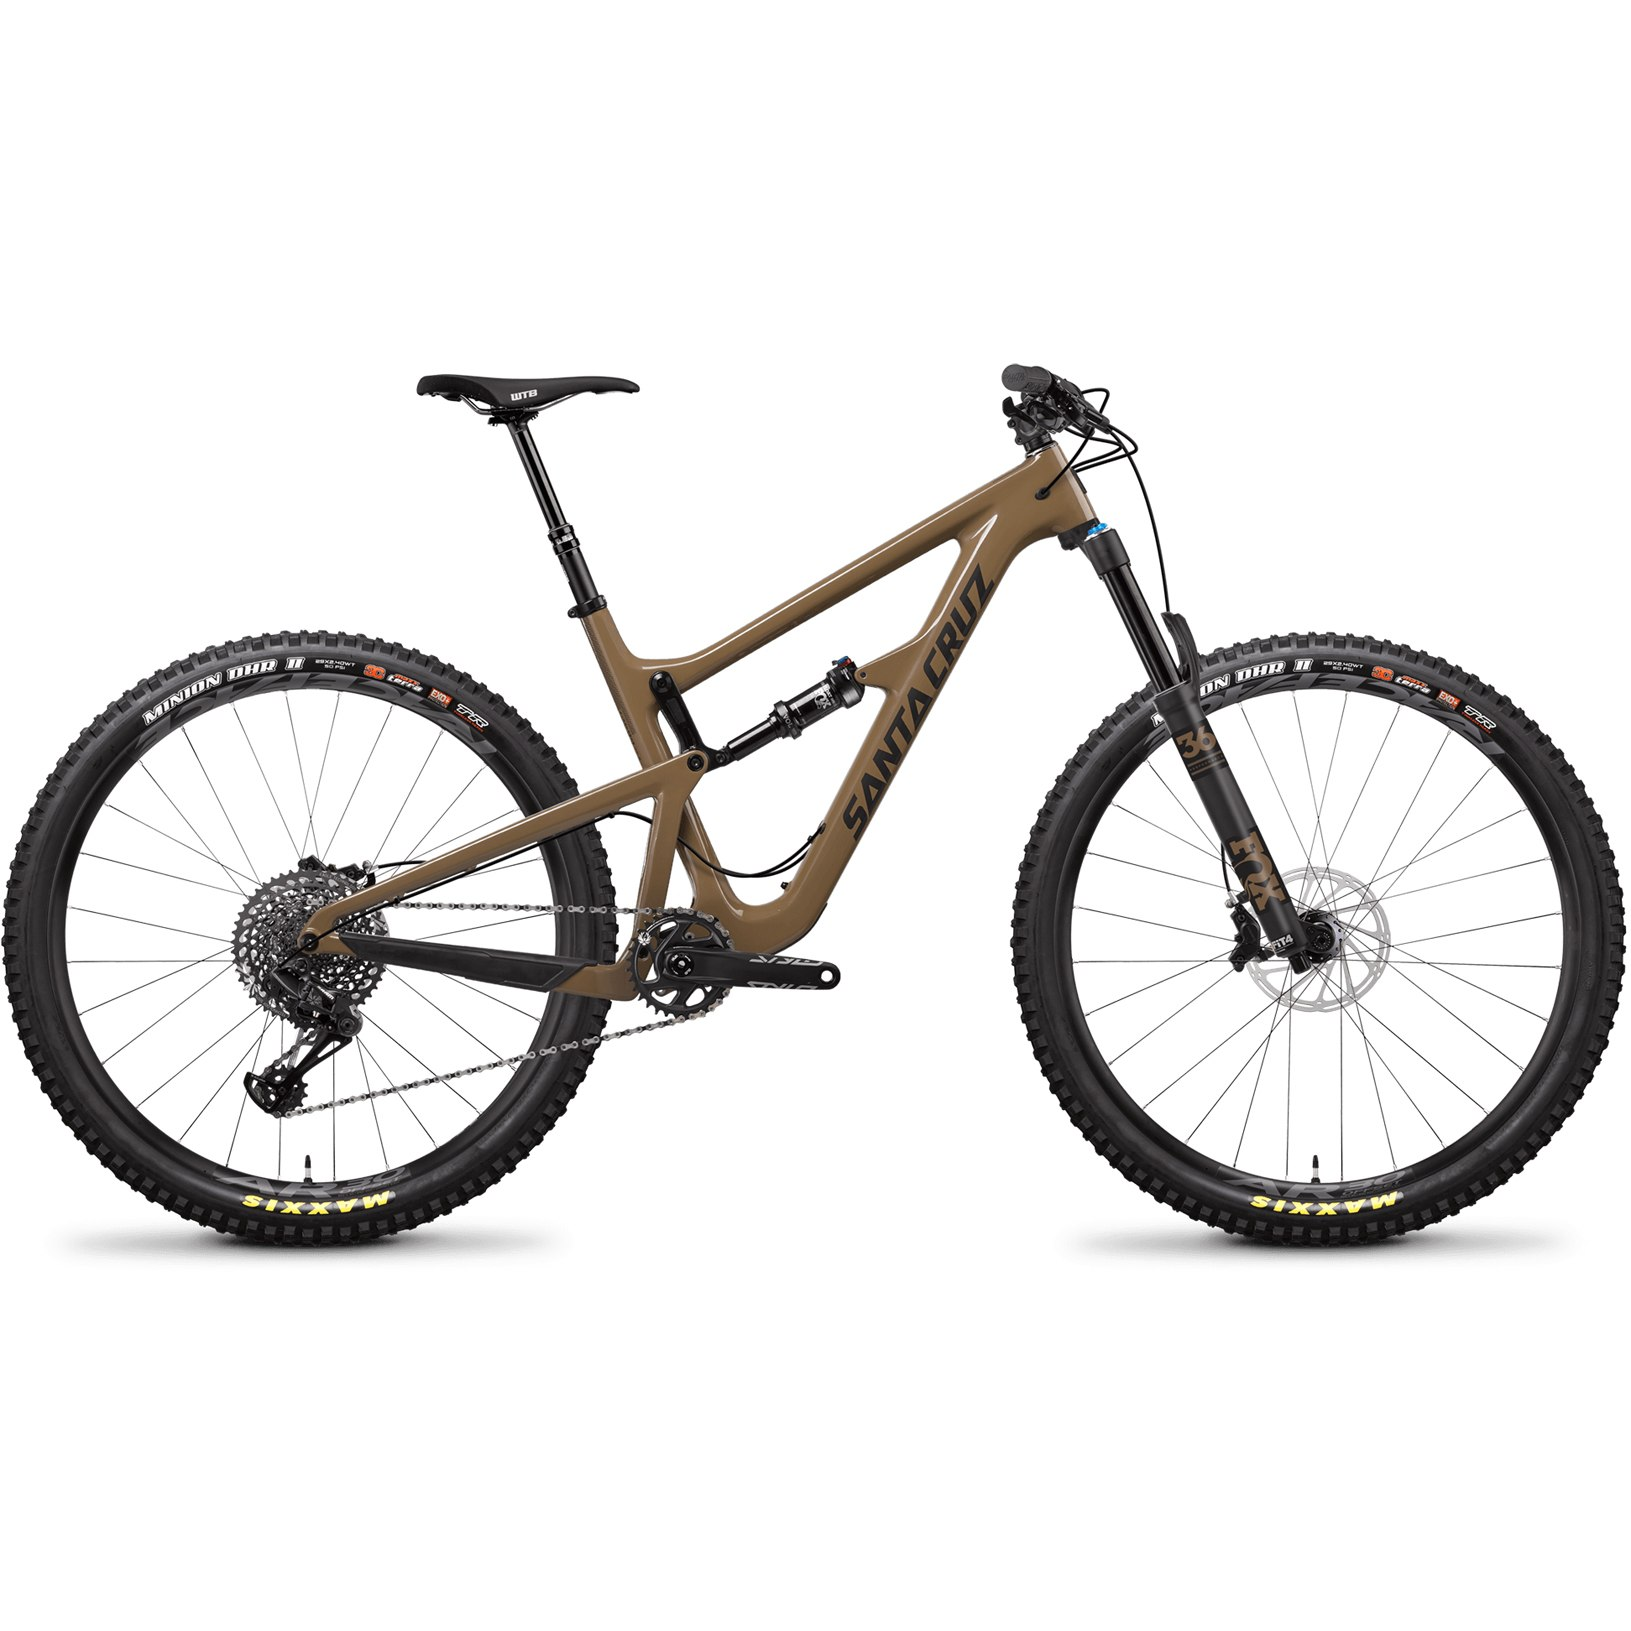 Santa Cruz HIGHTOWER LT CARBON C S Mountainbike - 2019 - clay & carbon